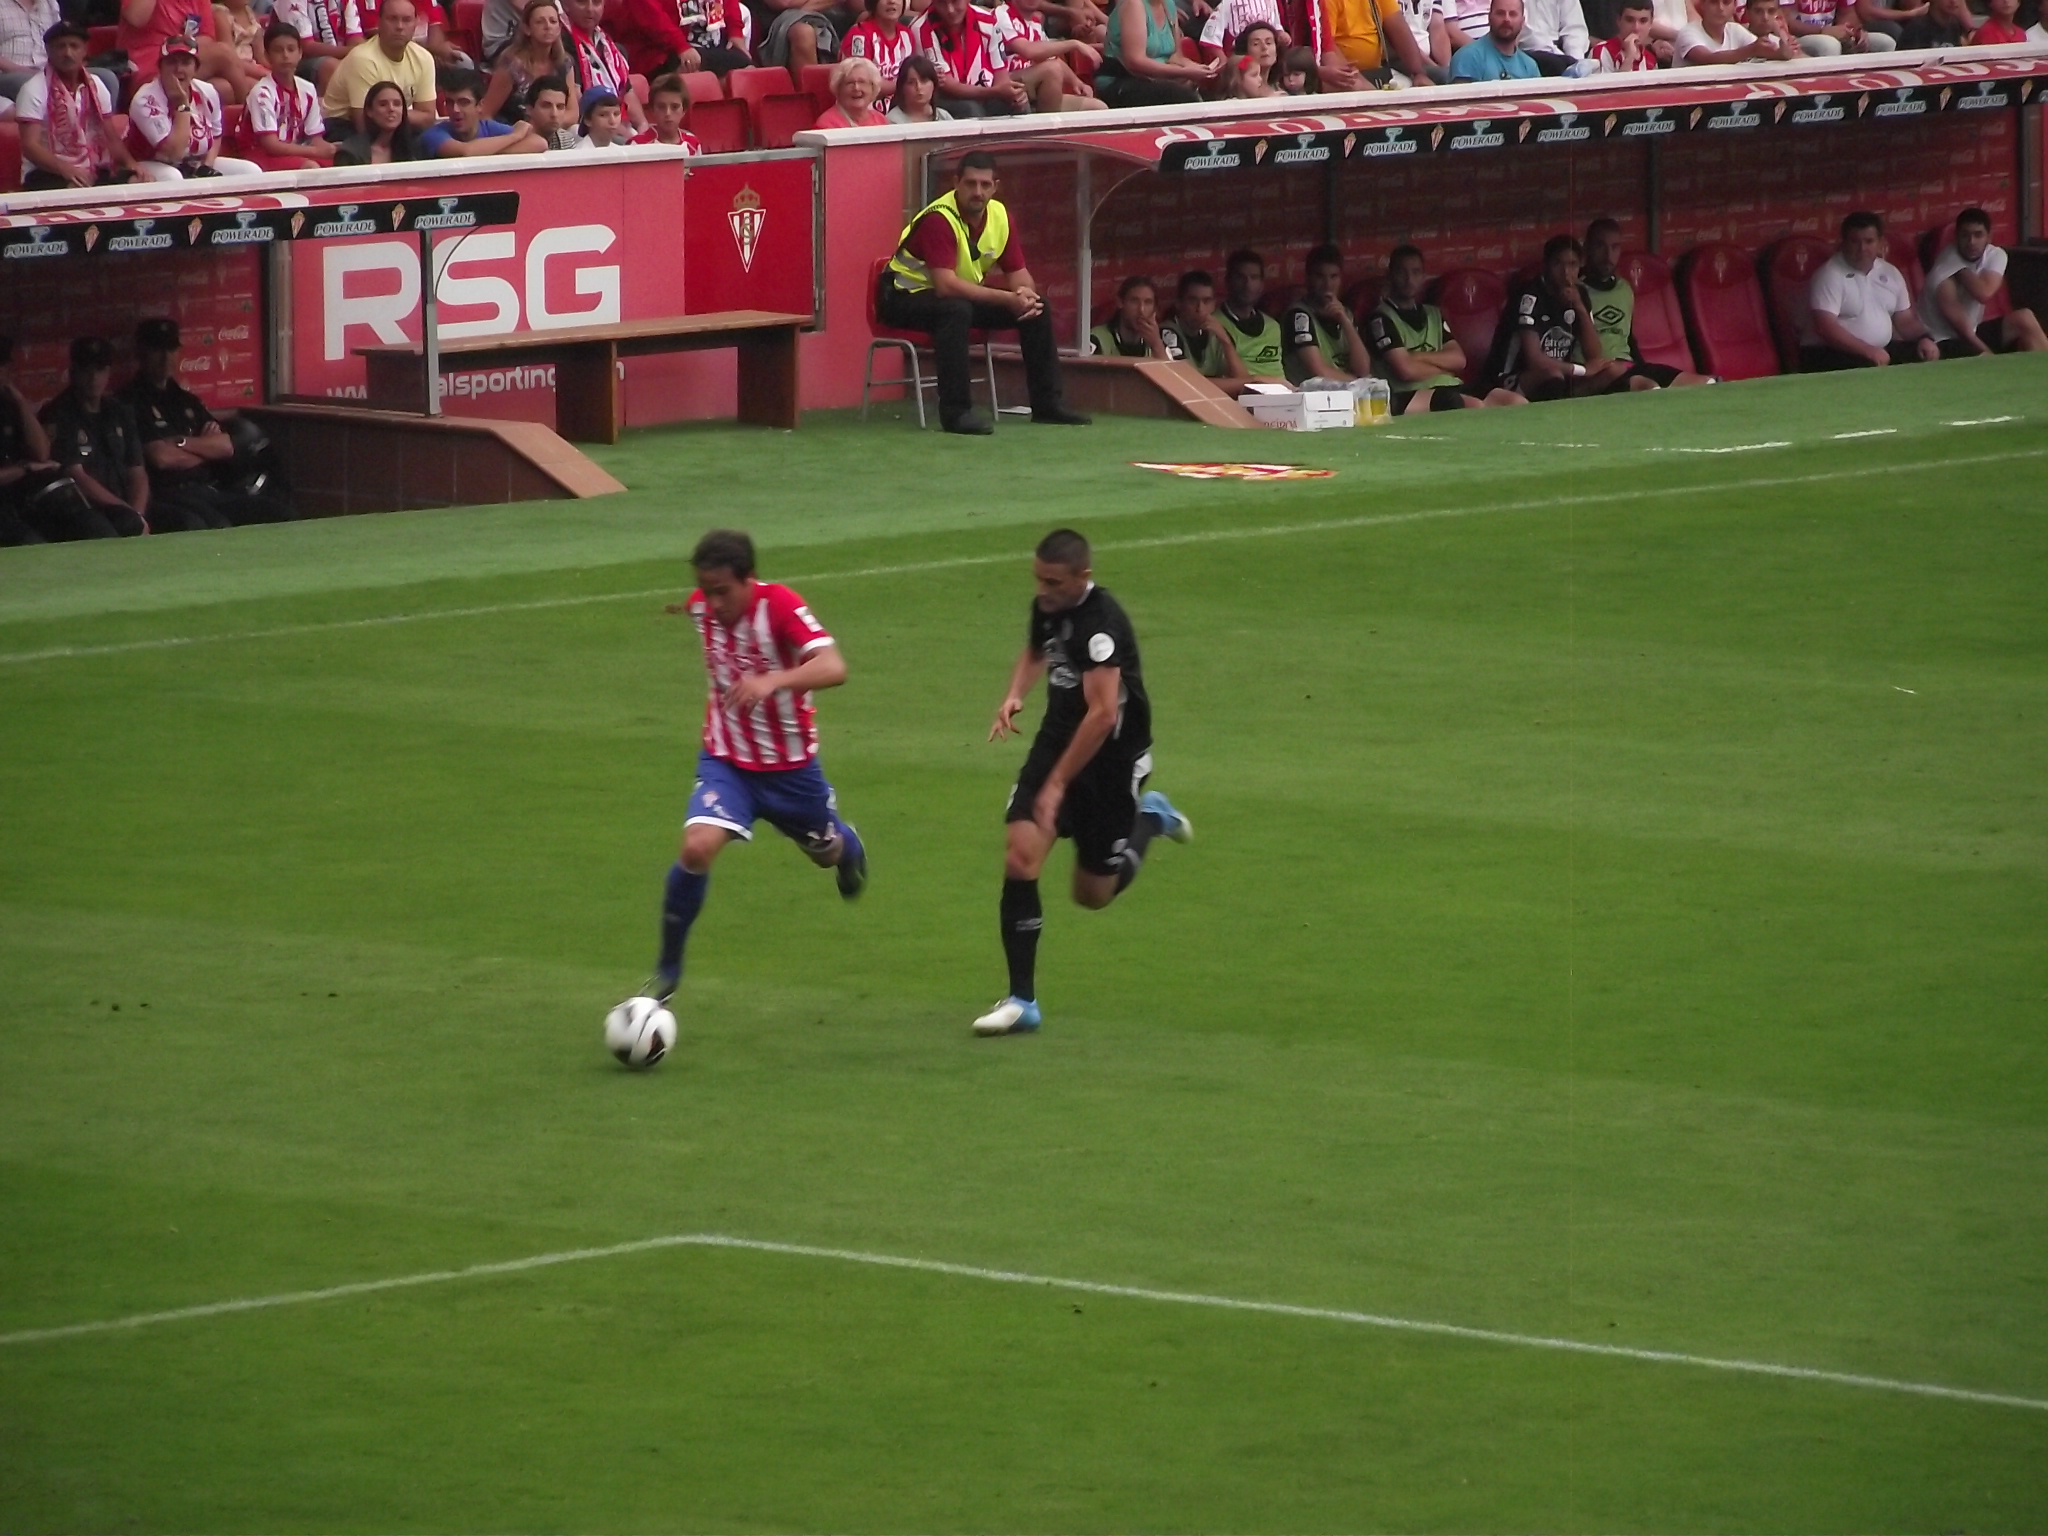 Sporting - Sabadell: puntuaciones del Sporting, jornada 12